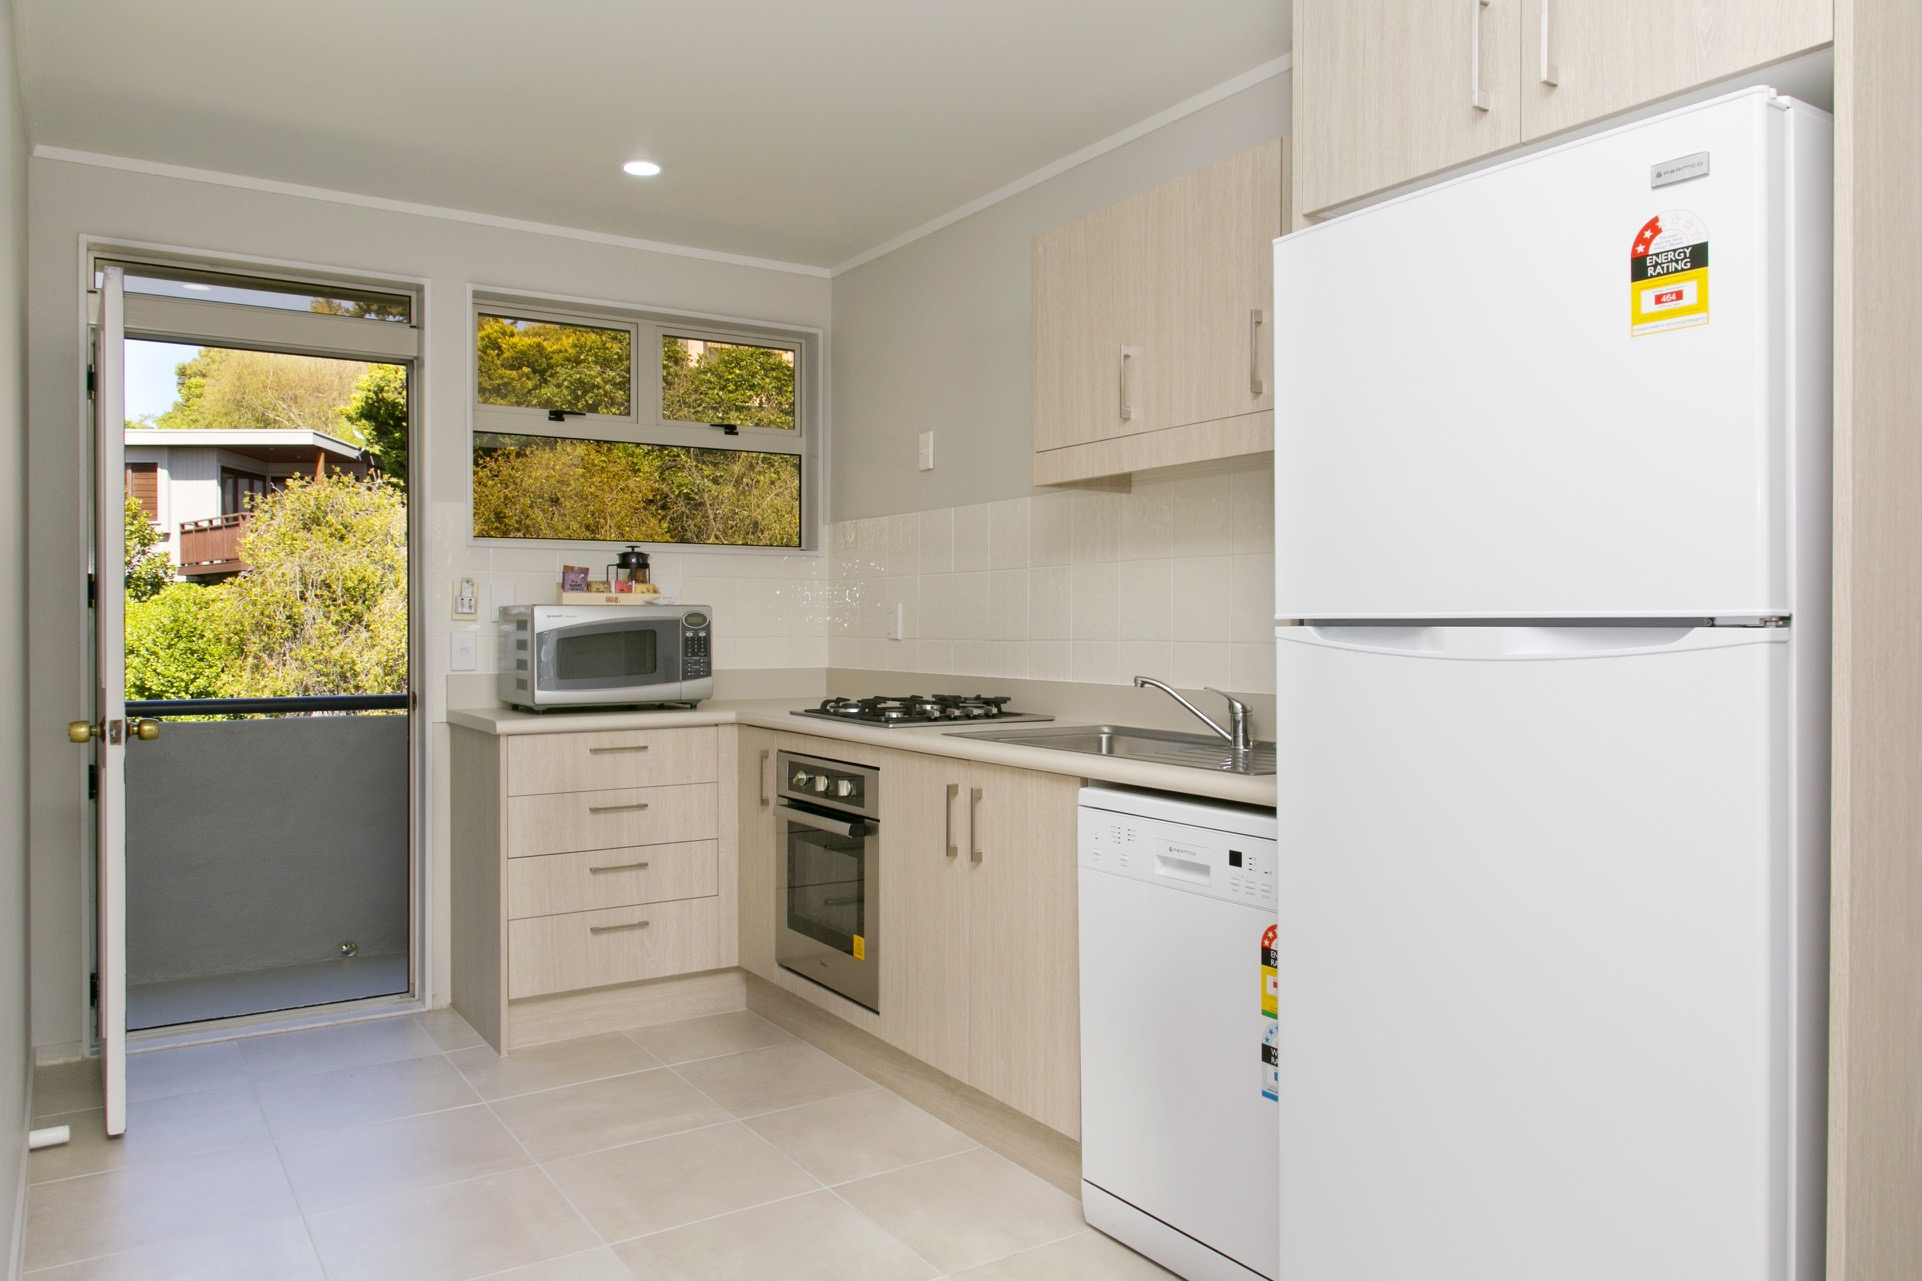 three bedroom kitchen.jpg